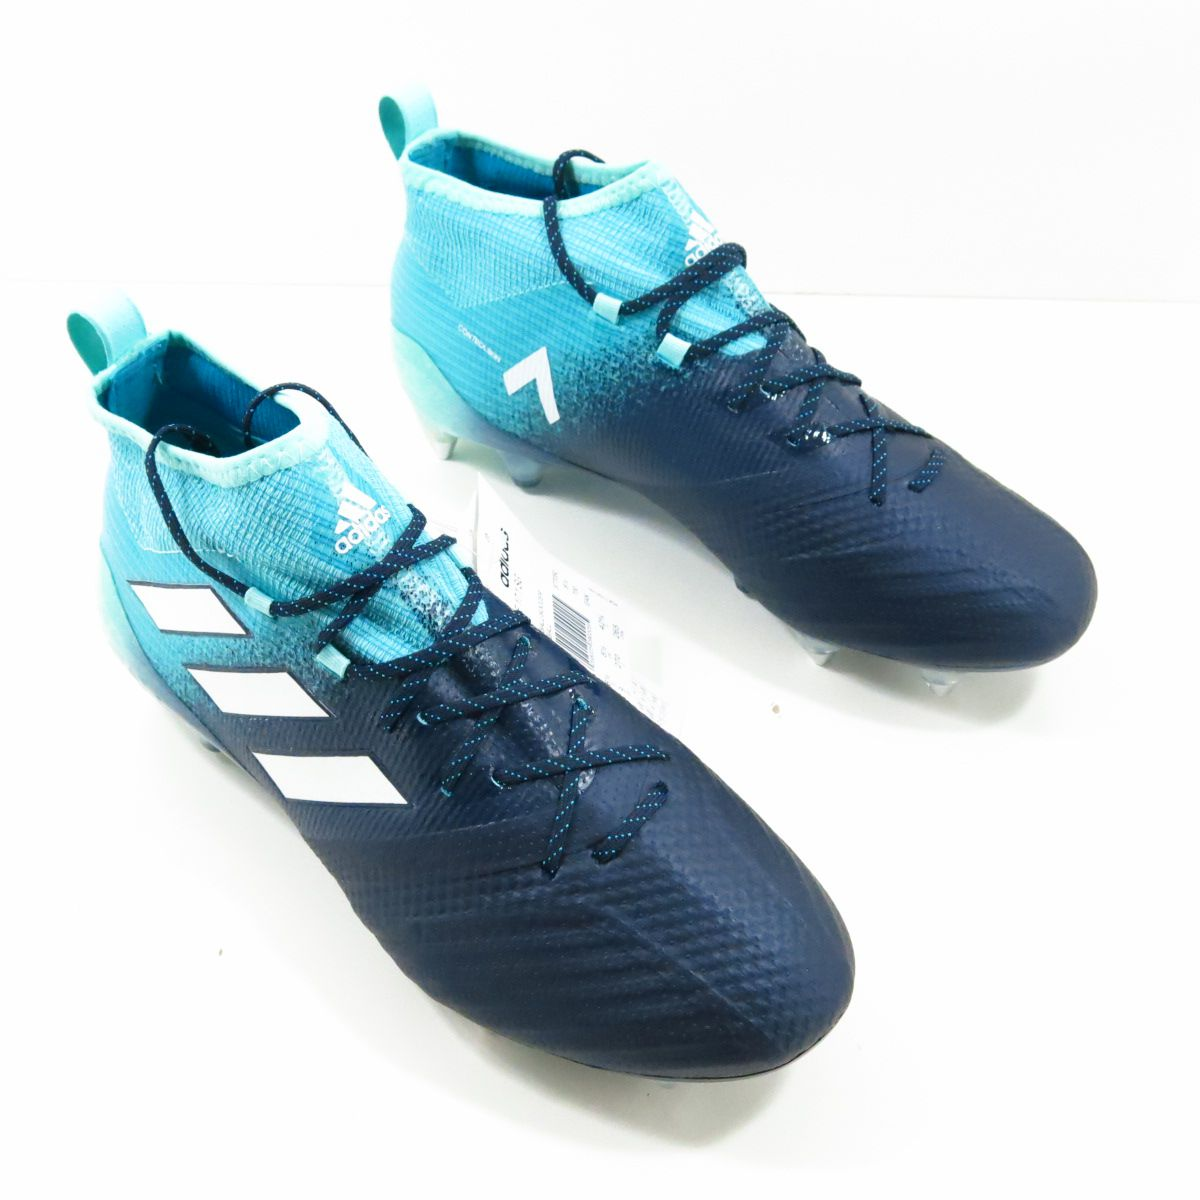 Chuteira Adidas Ace 17.1 SG Elite - Trava Mista